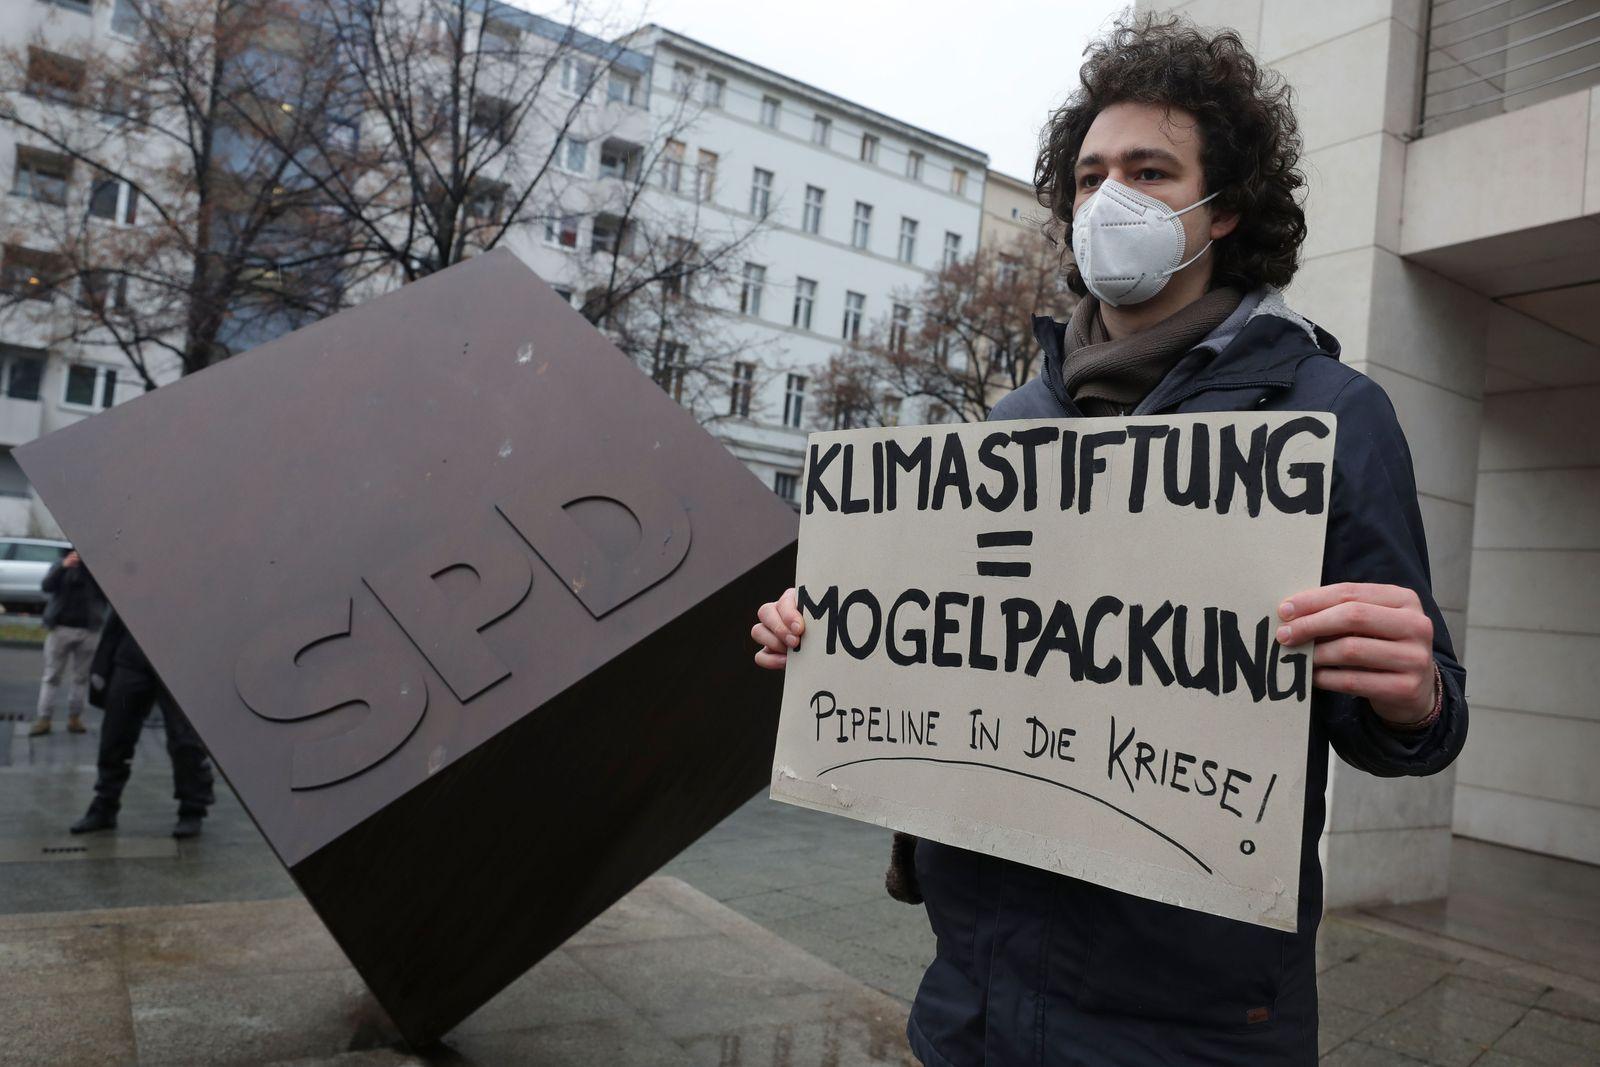 Environmental activists ciriticize Nord Stream 2 gas pipeline, Berlin, Germany - 12 Jan 2021